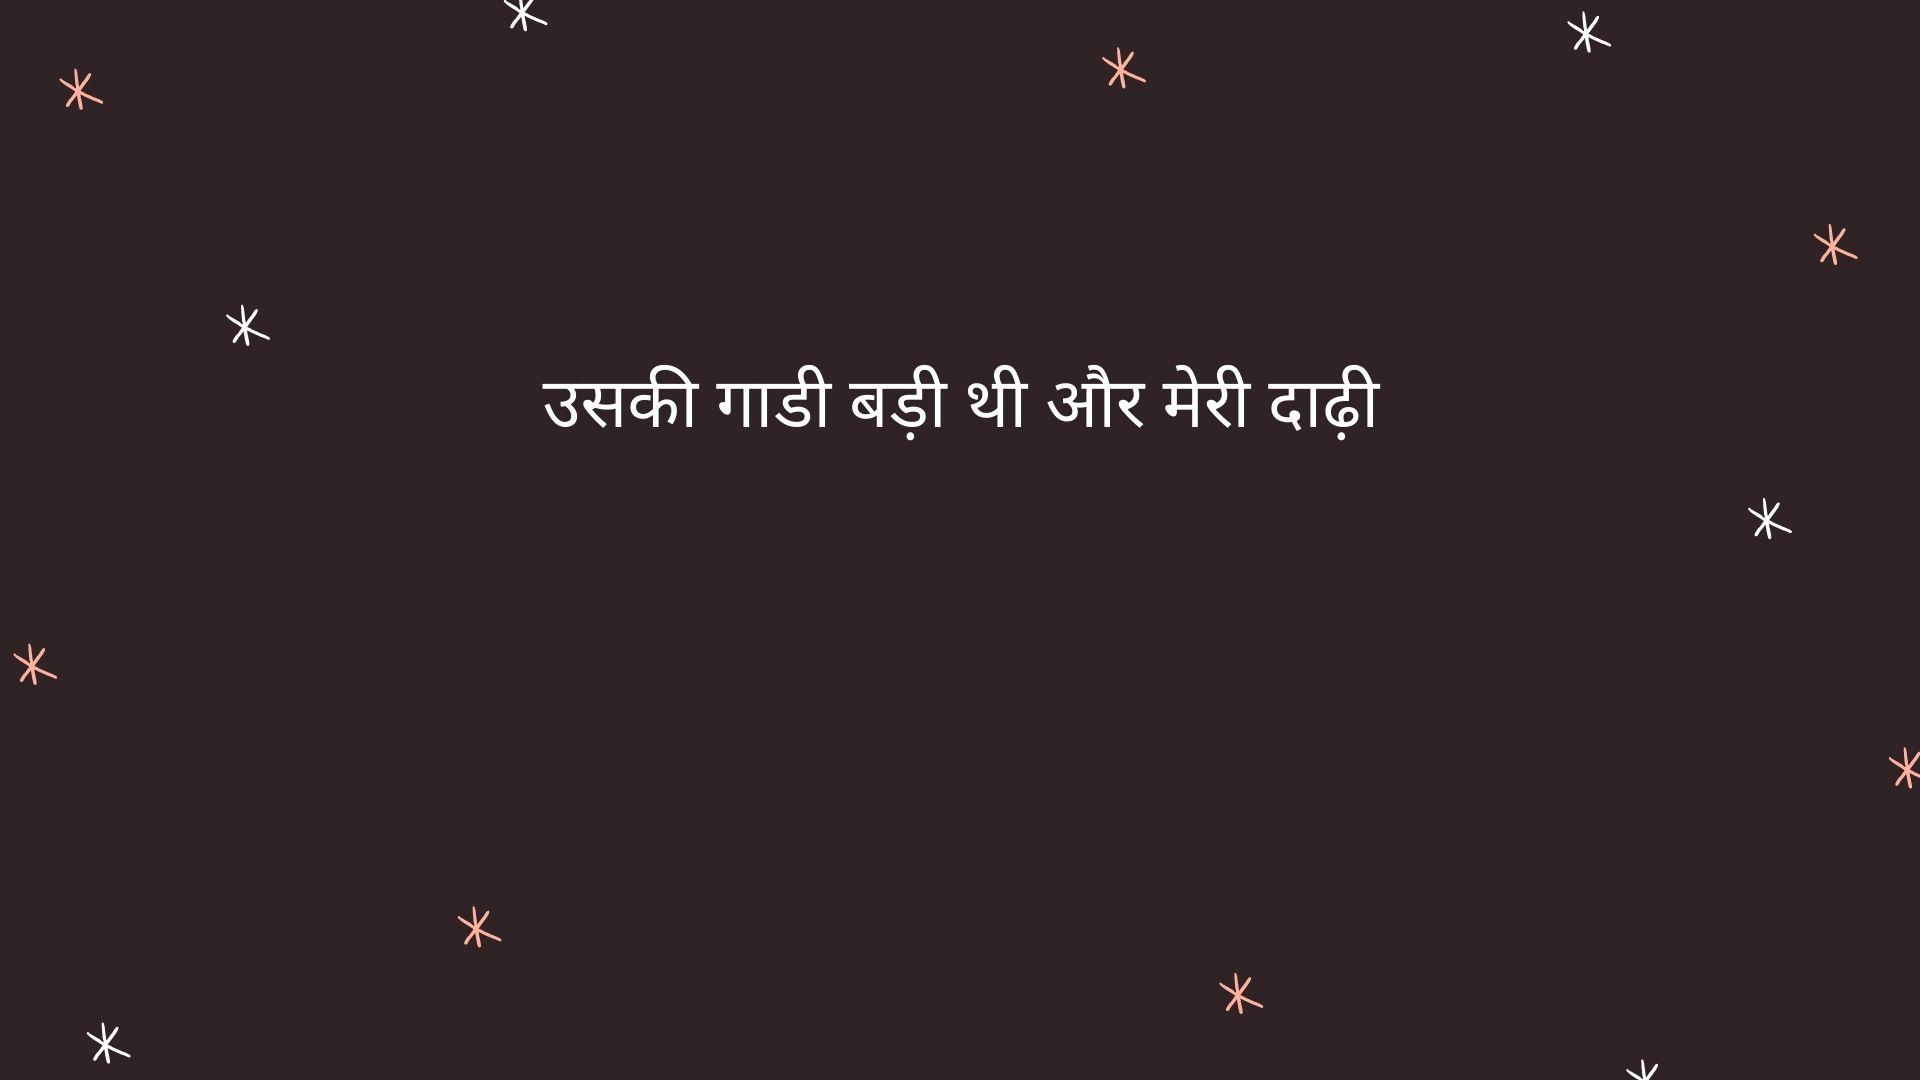 One Line Status in Hindi – 1 लाइन स्टेटस इन हिंदी